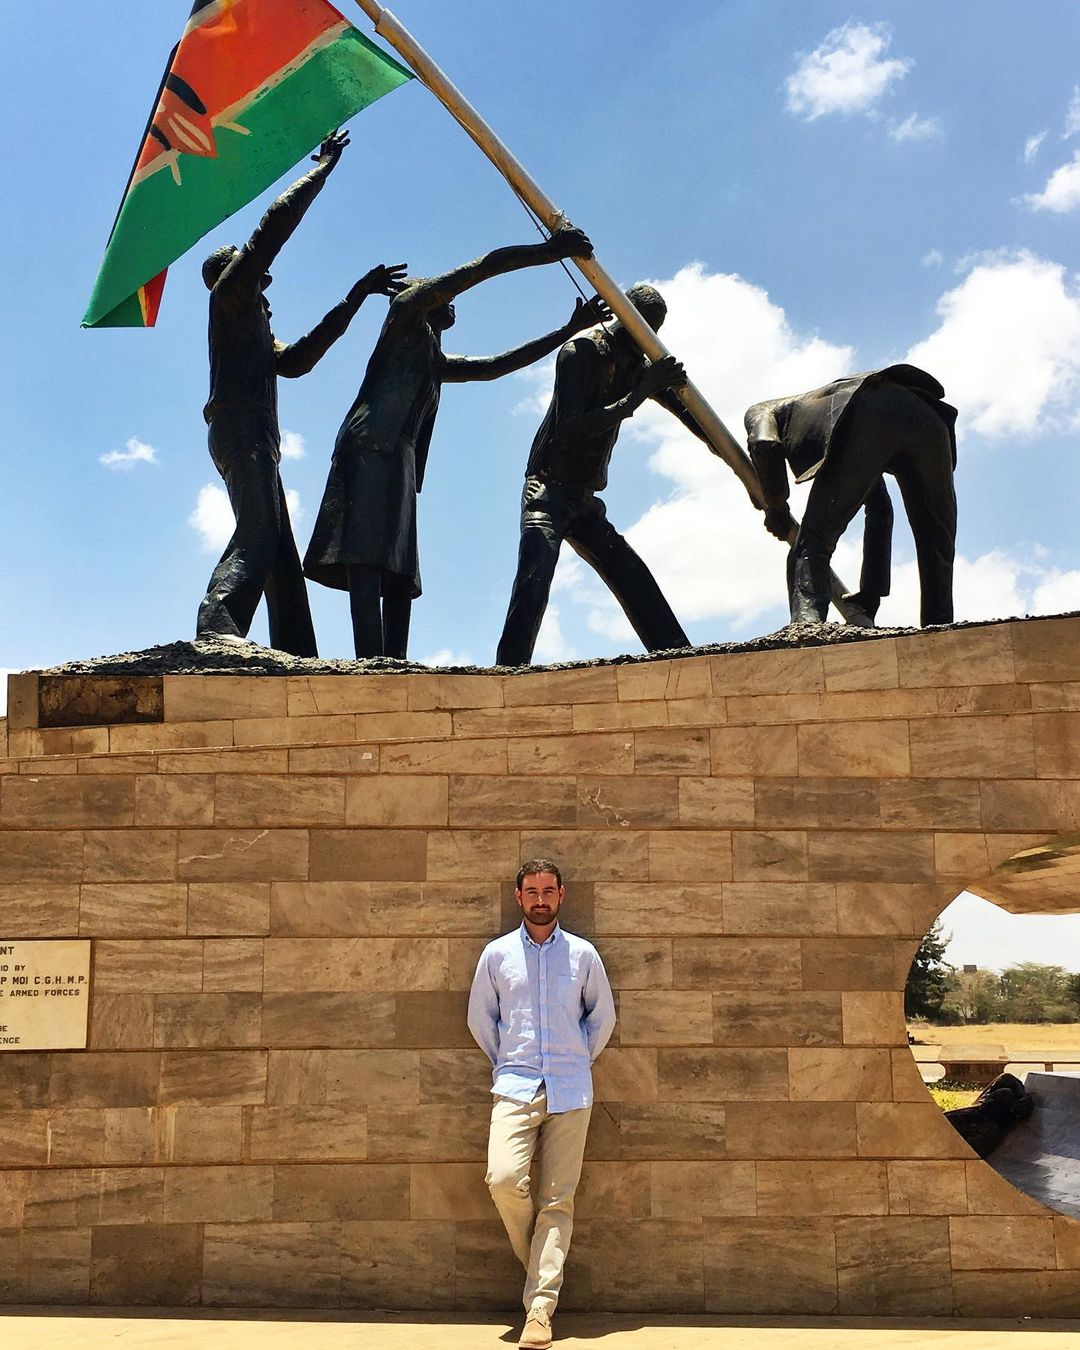 monuments in Nairobi kenya